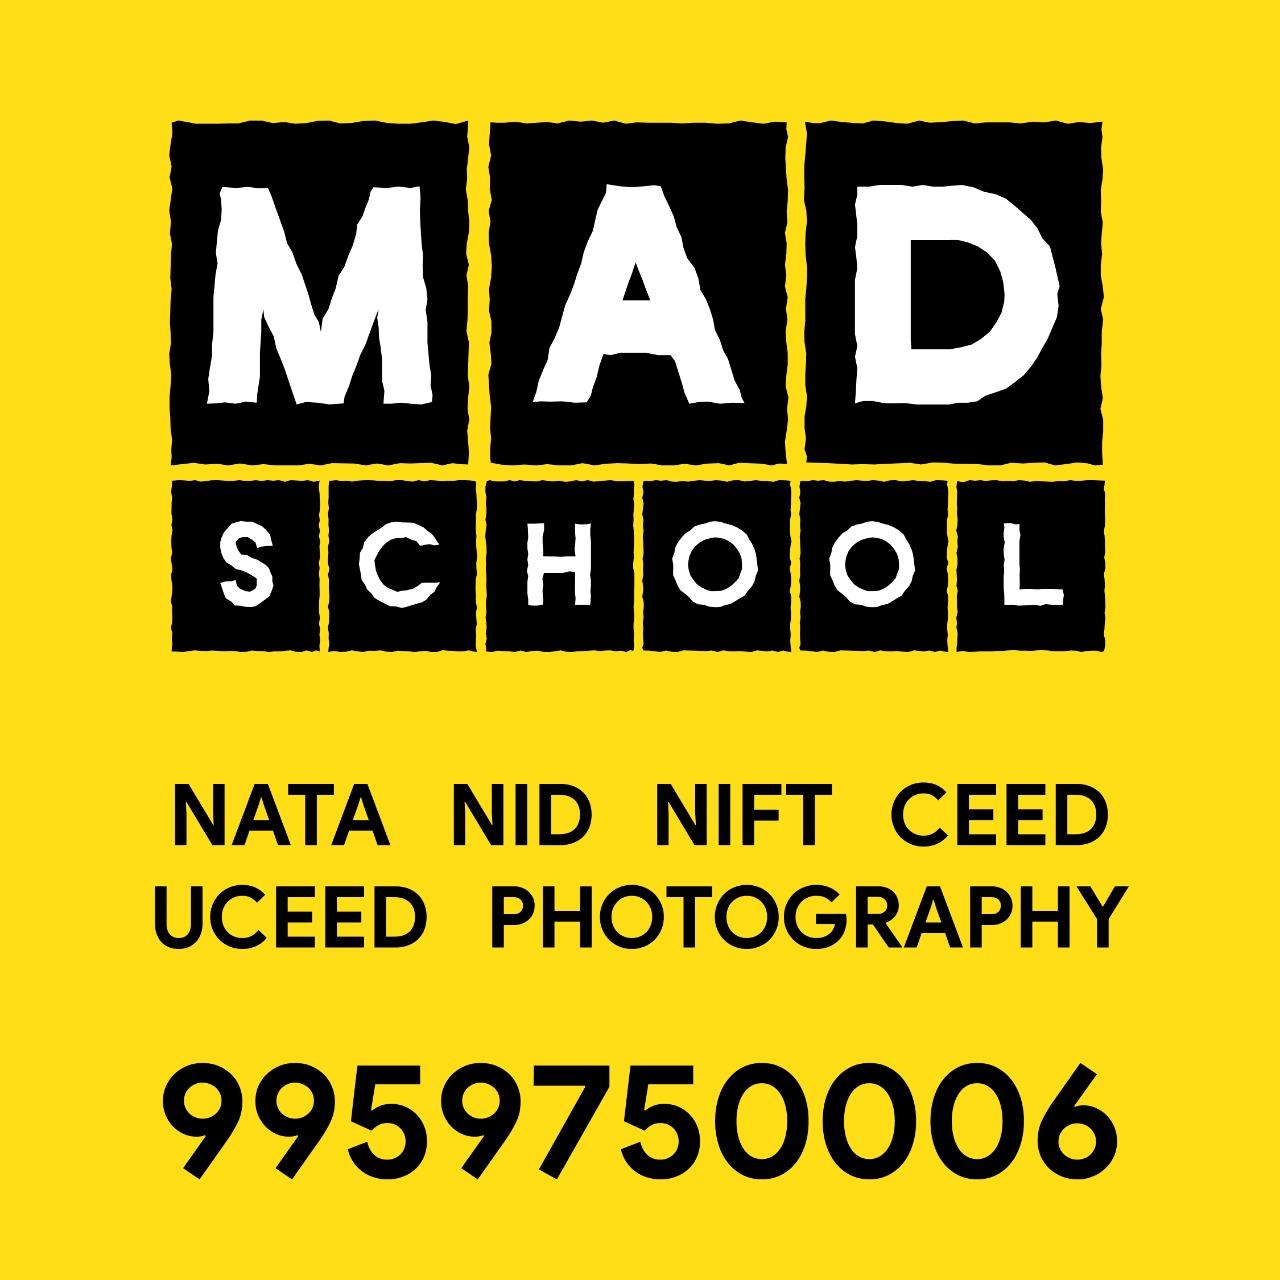 Madschool-SchoSys.com